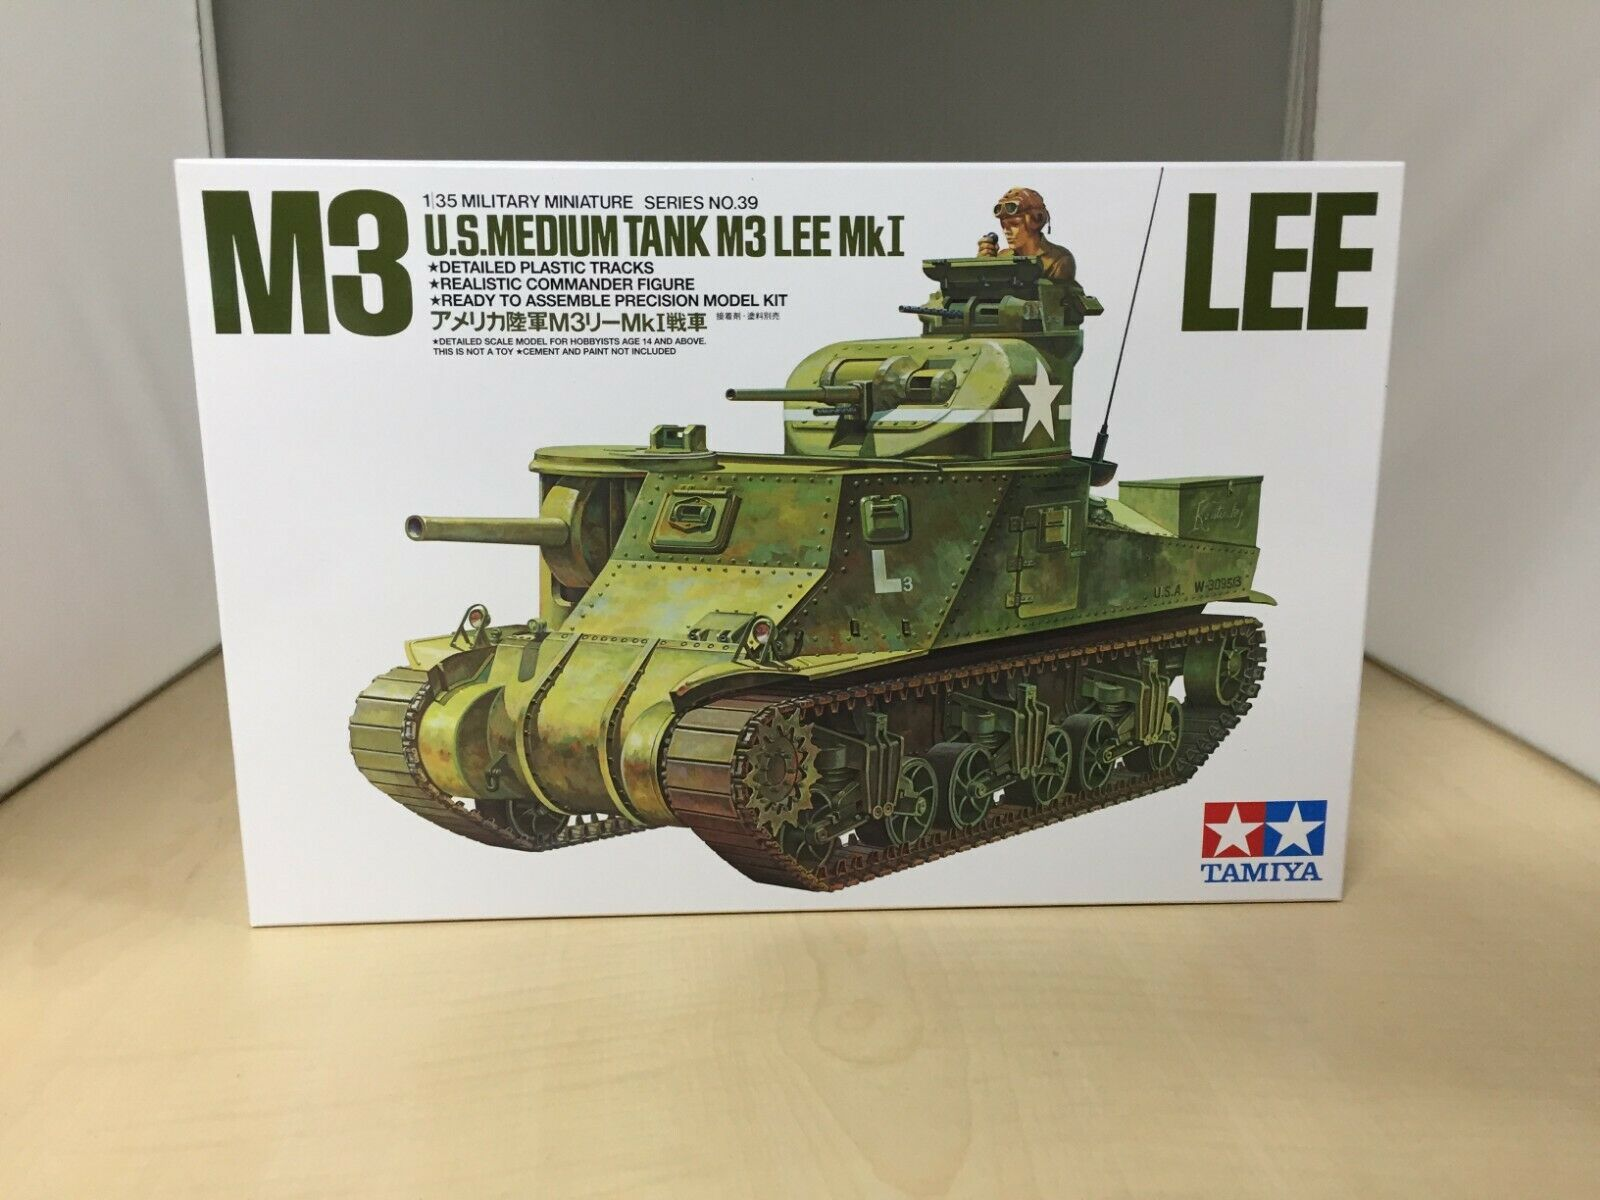 Tamiya 1 35 Military Miniature Series No.39 US Army M3 Lee Mk.1 Tank